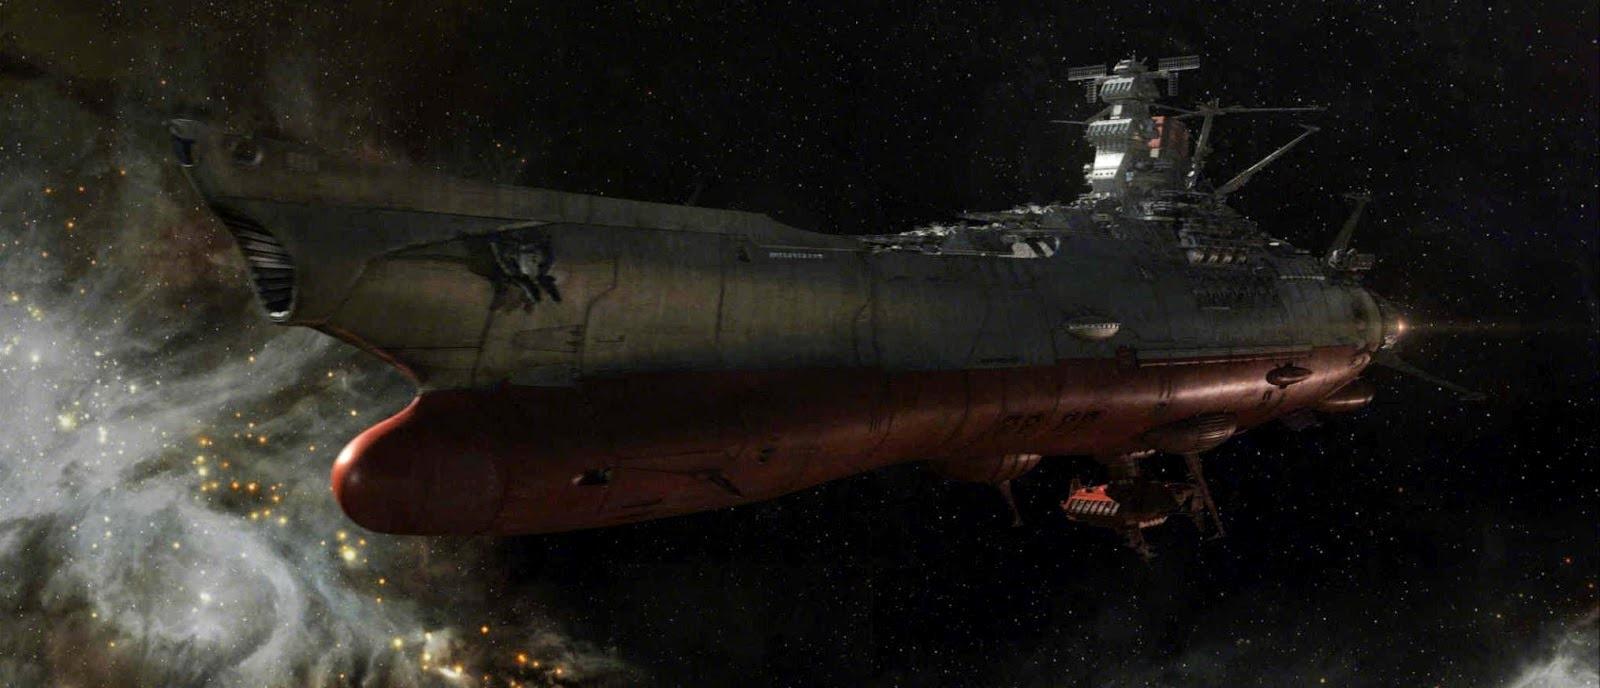 The Yamato on its interstellar journey in Space Battleship Yamato (2010)